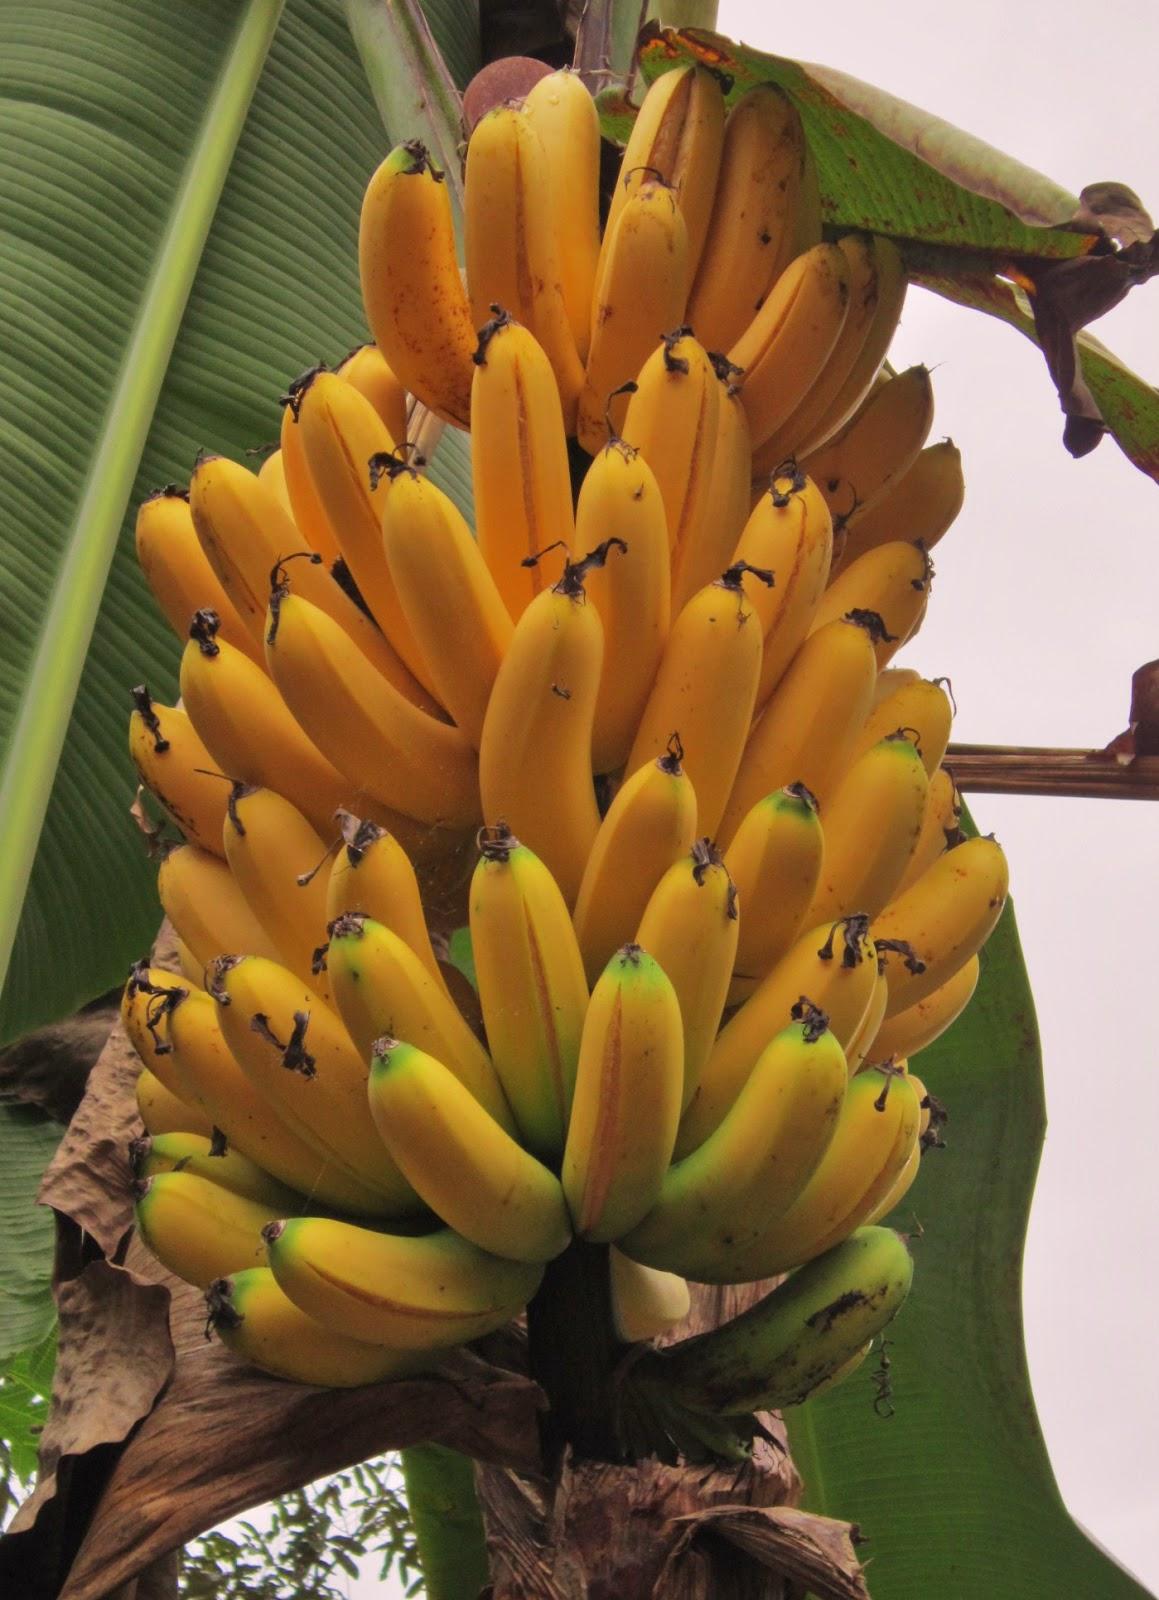 Jane 隨心所欲: 砍香蕉树记